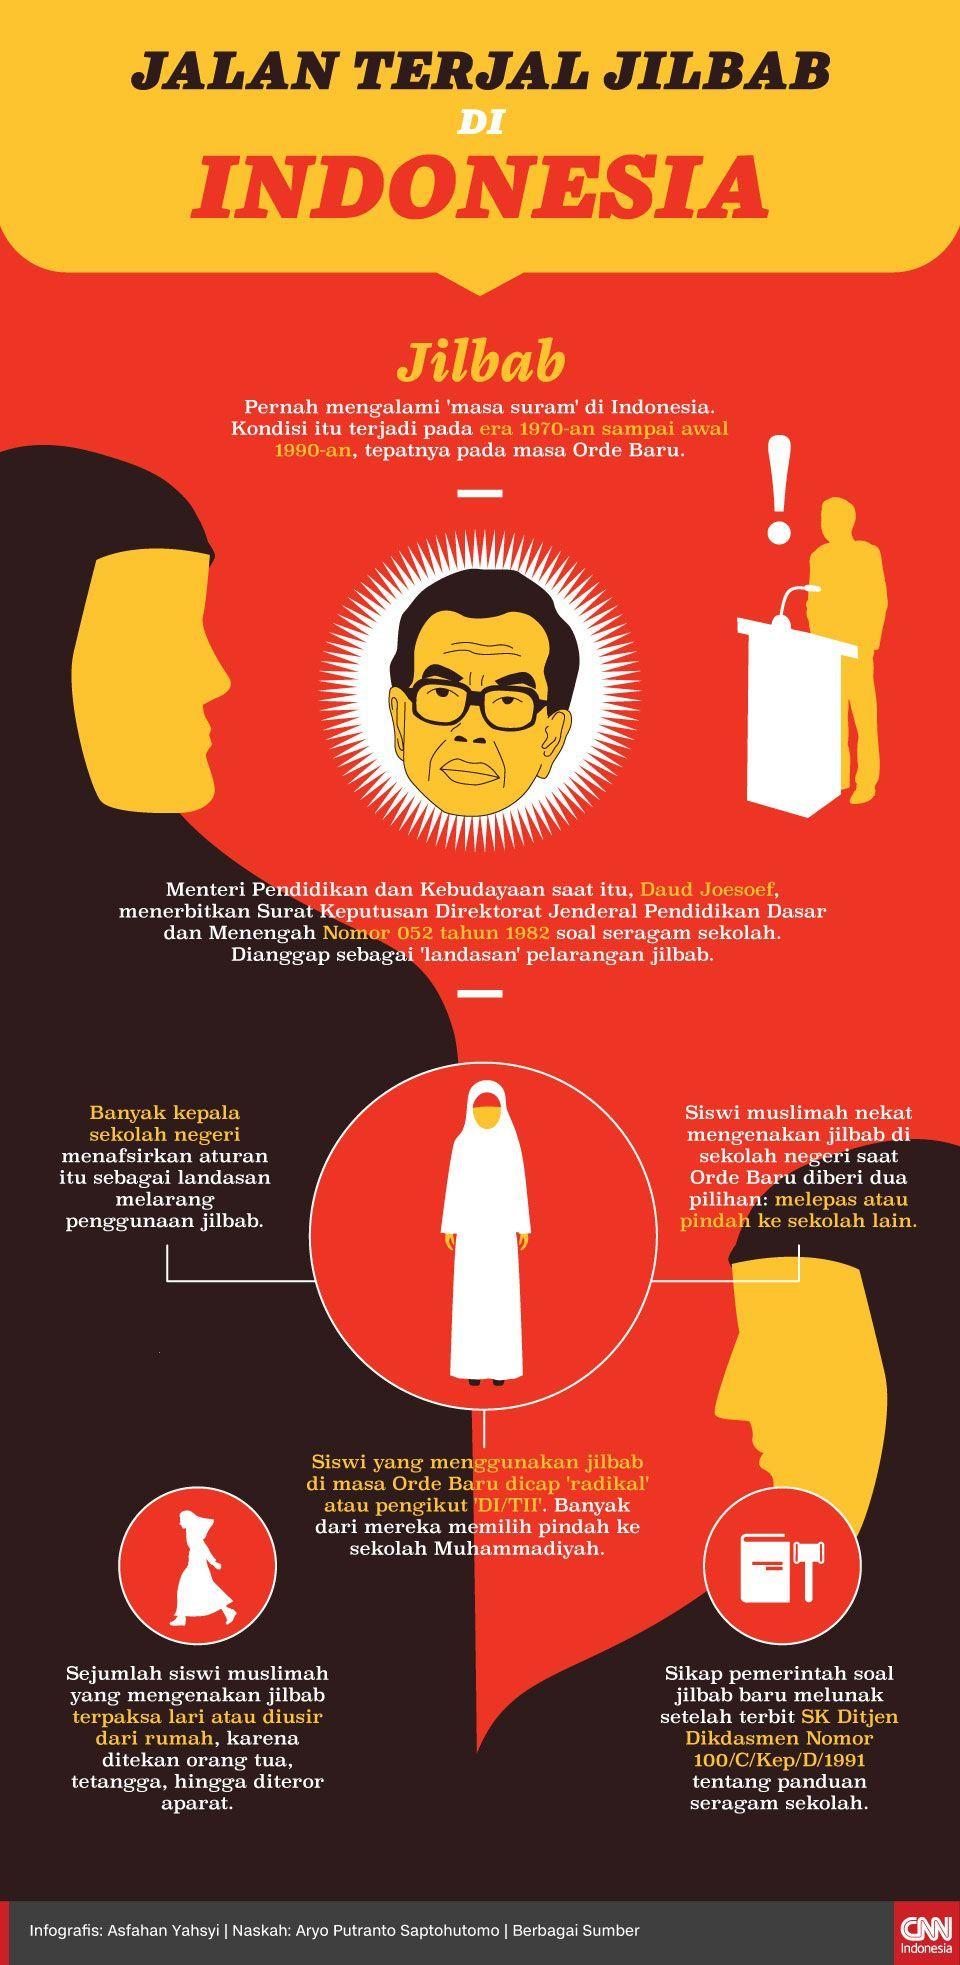 Infografis Jalan Terjal Jilbab di Indonesia